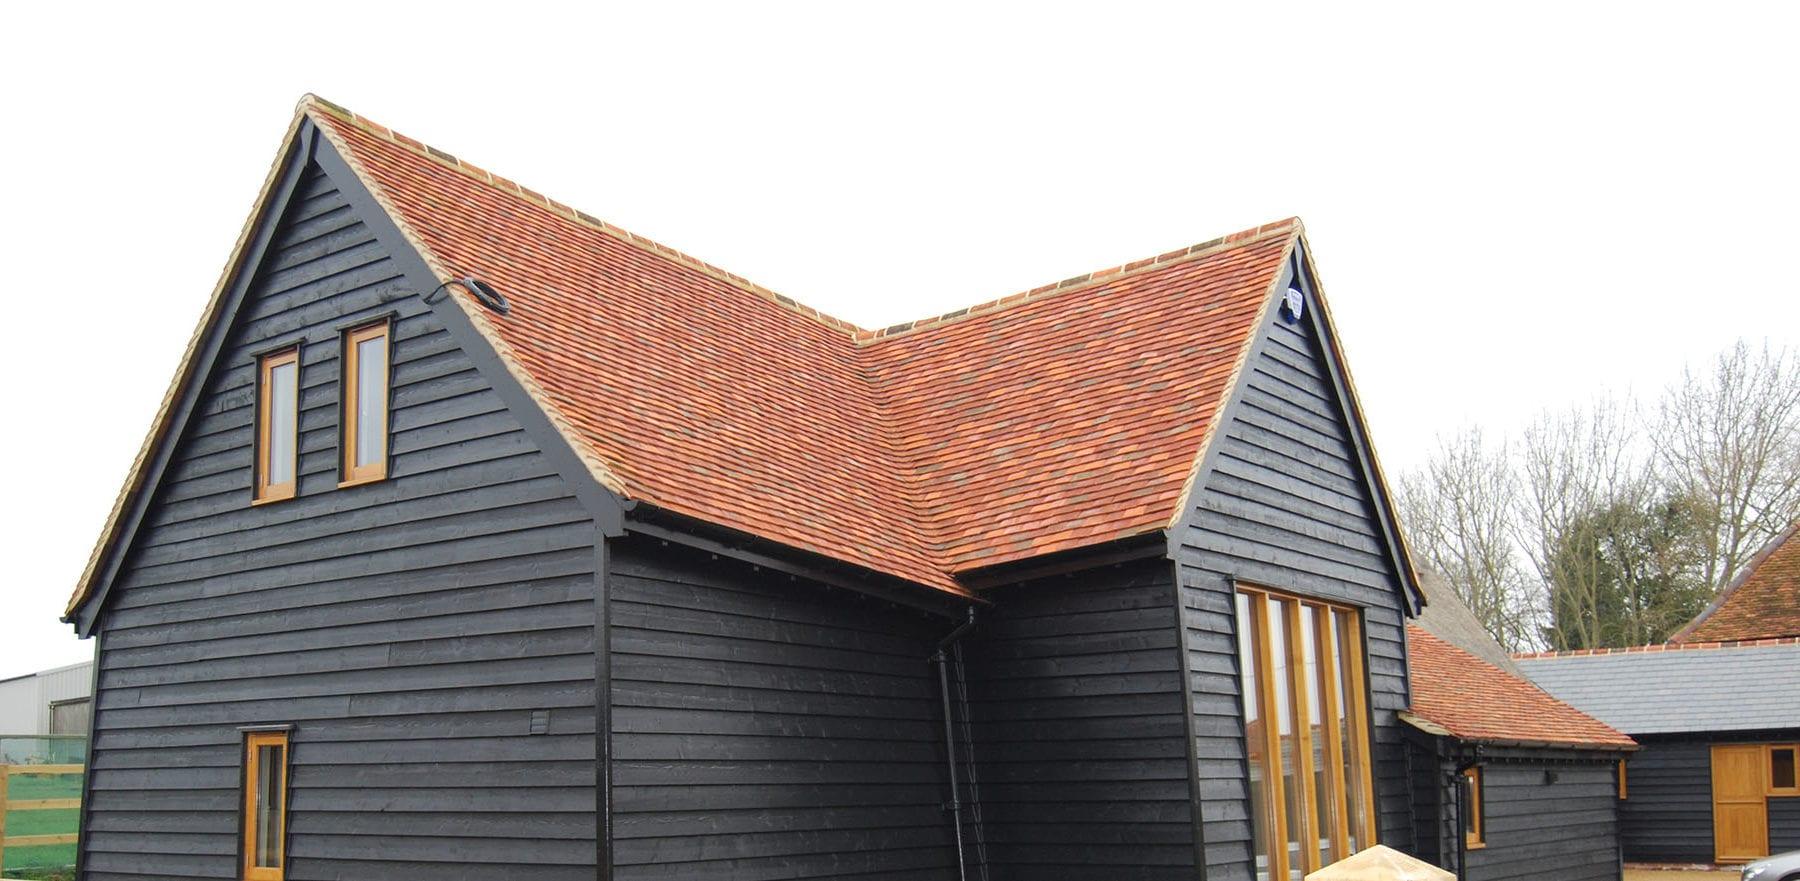 Lifestiles - Handmade Multi Clay Roof Tiles - Ford End, England 5